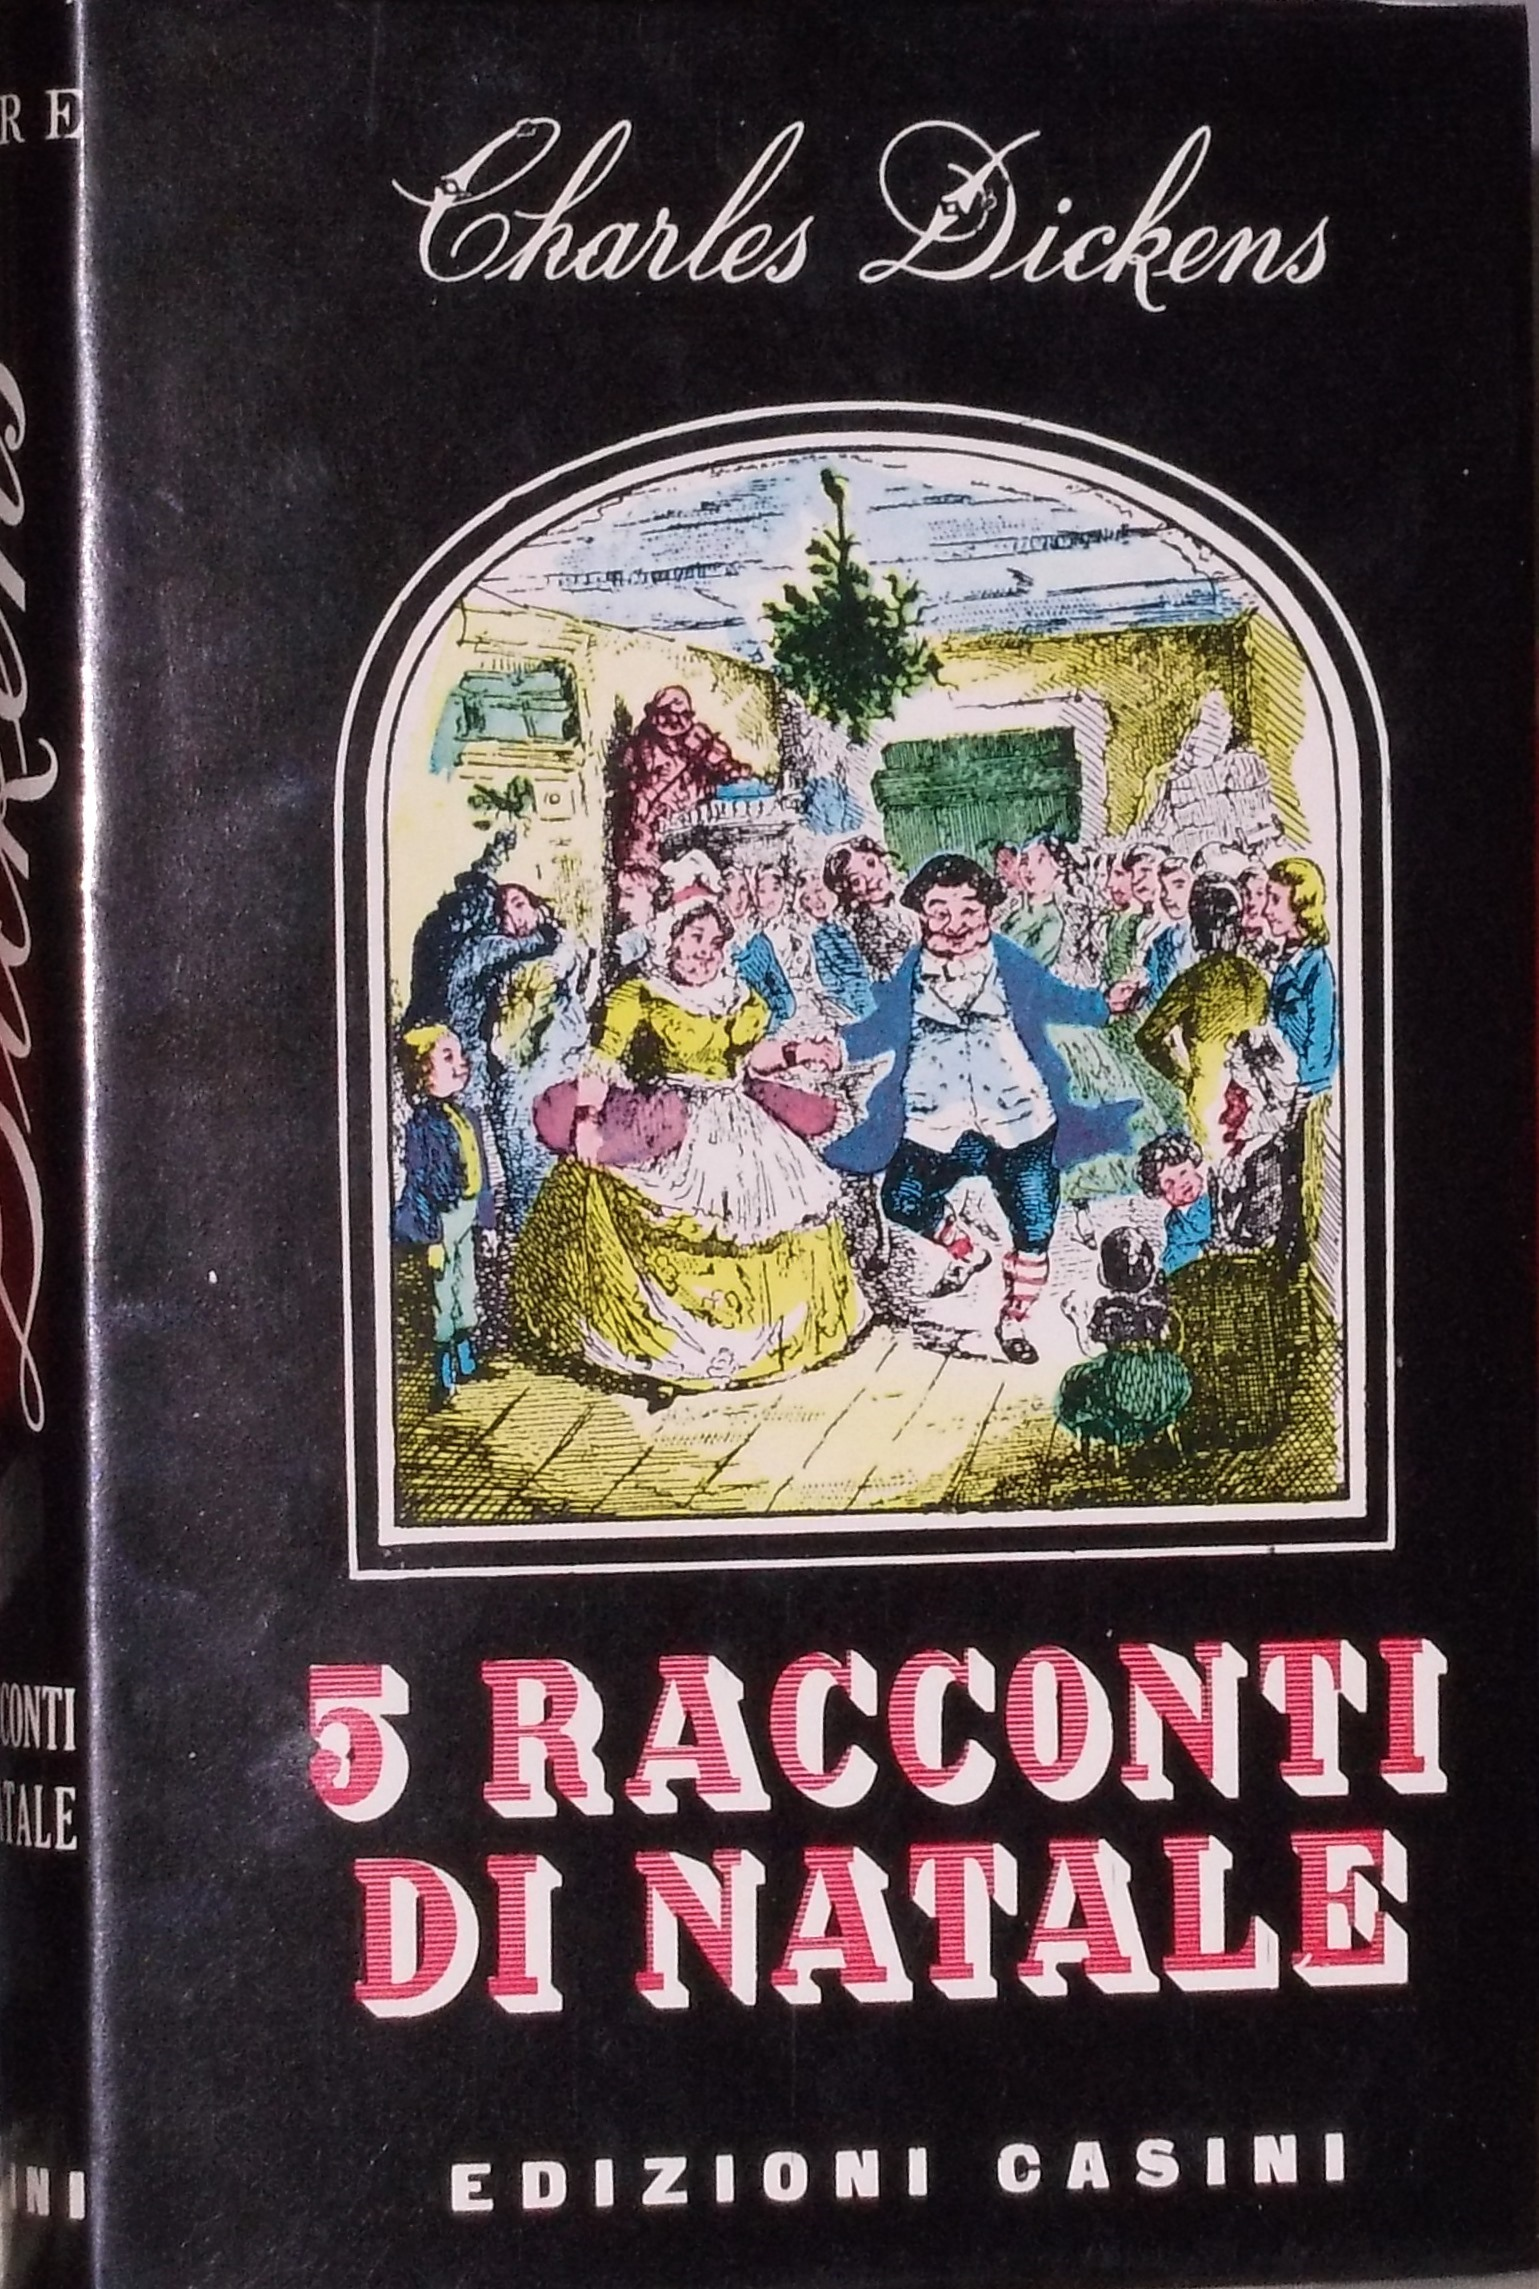 5 racconti di Natale- Dickens -'59 (prima ed.It. racc.riuniti)